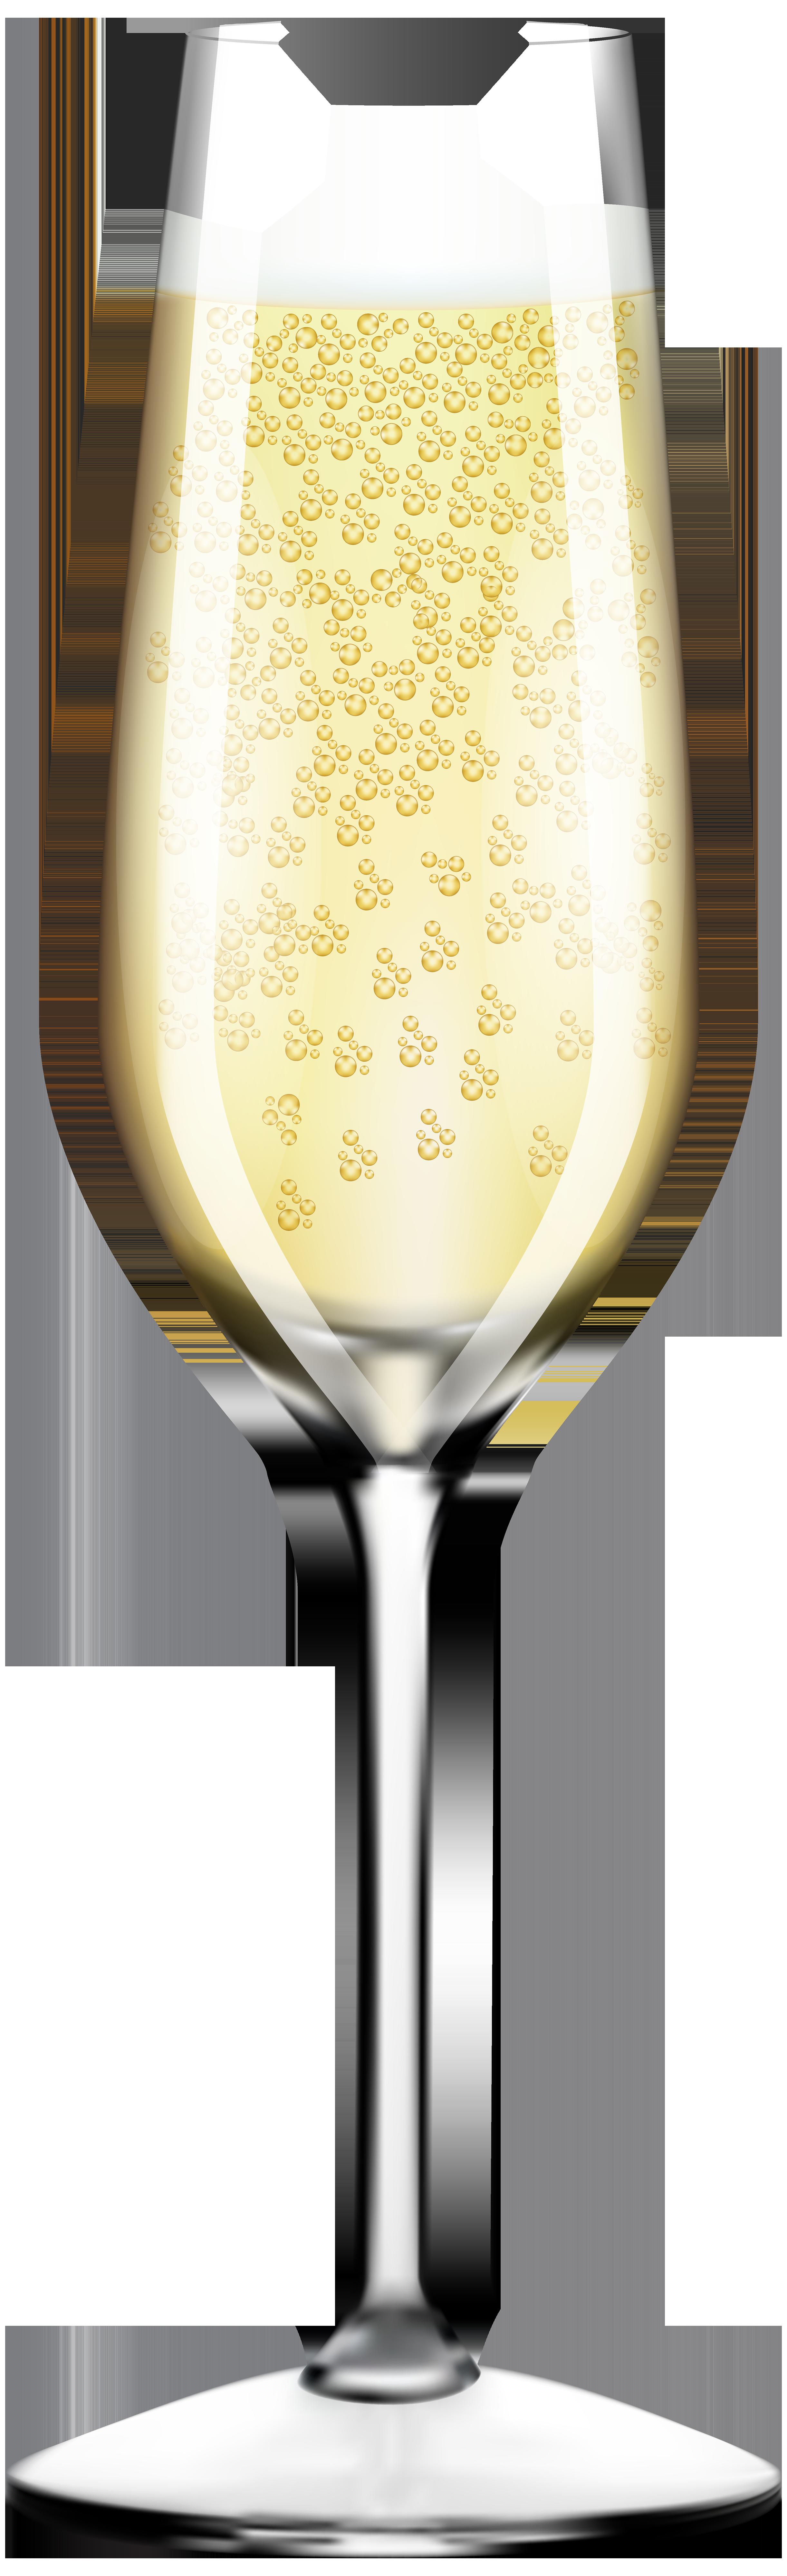 Champagne glass png clip. Flutes clipart champaigne